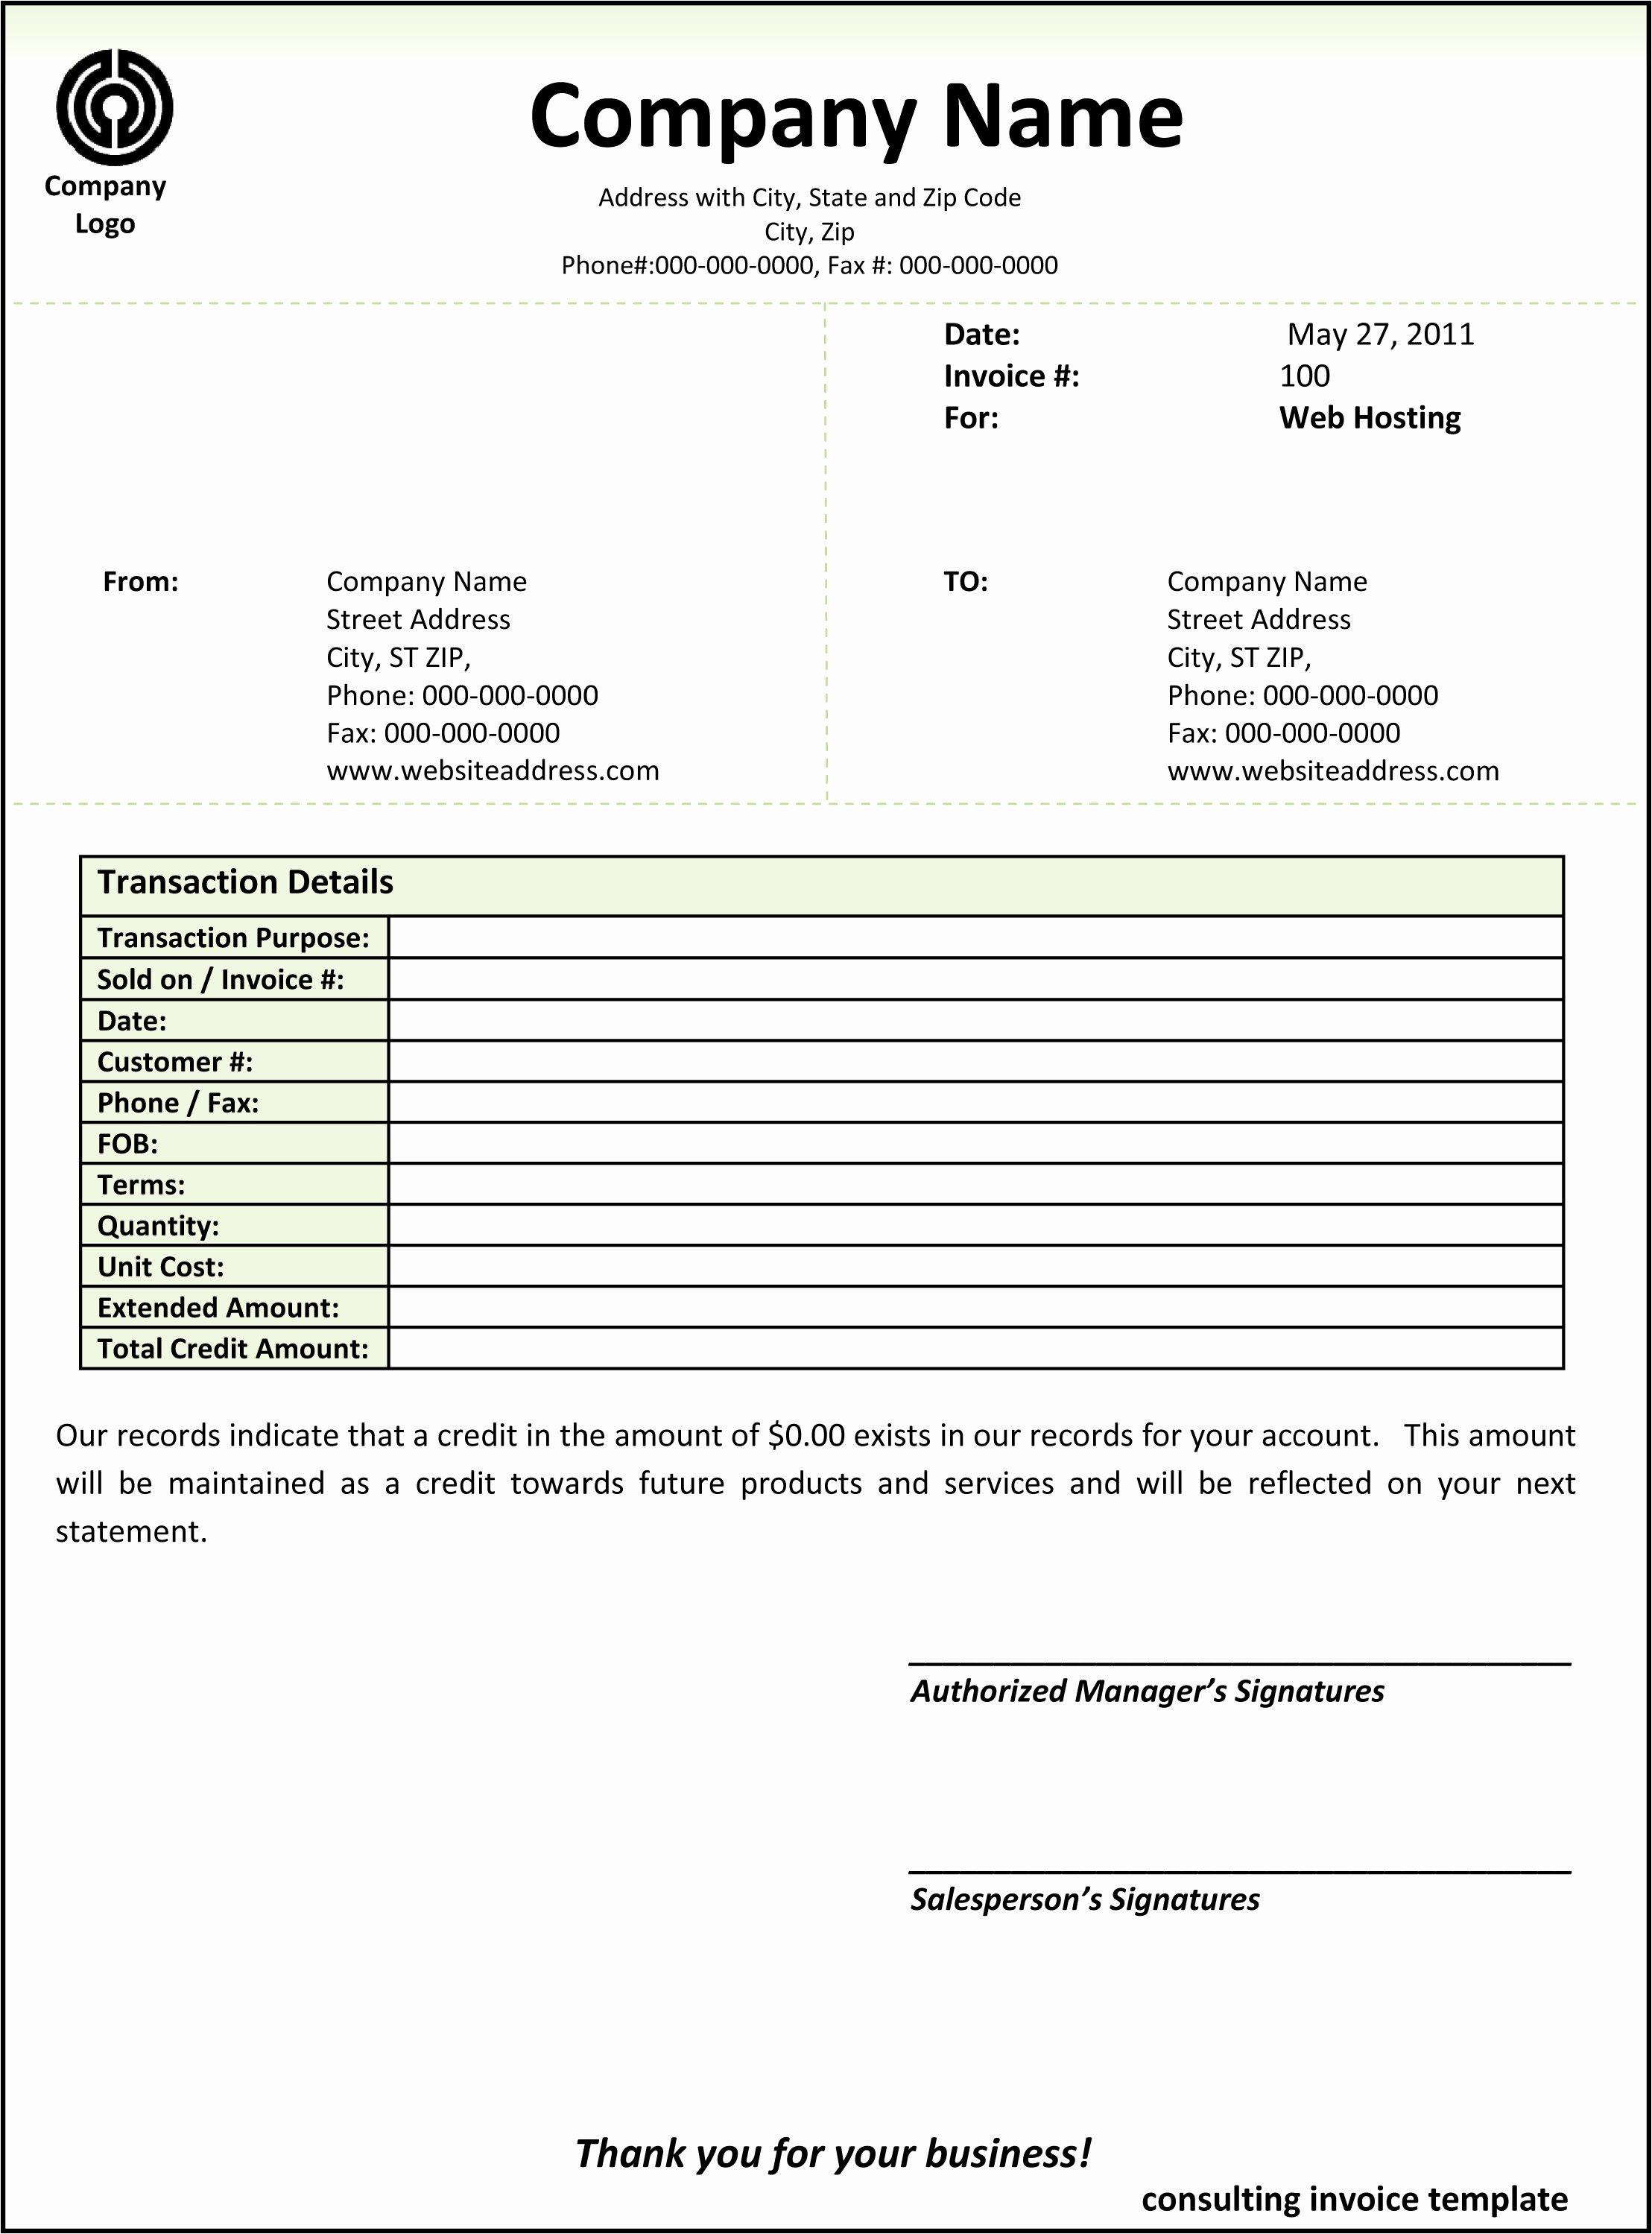 Consulting Invoice Template Word Unique Consulting Invoice Template Word